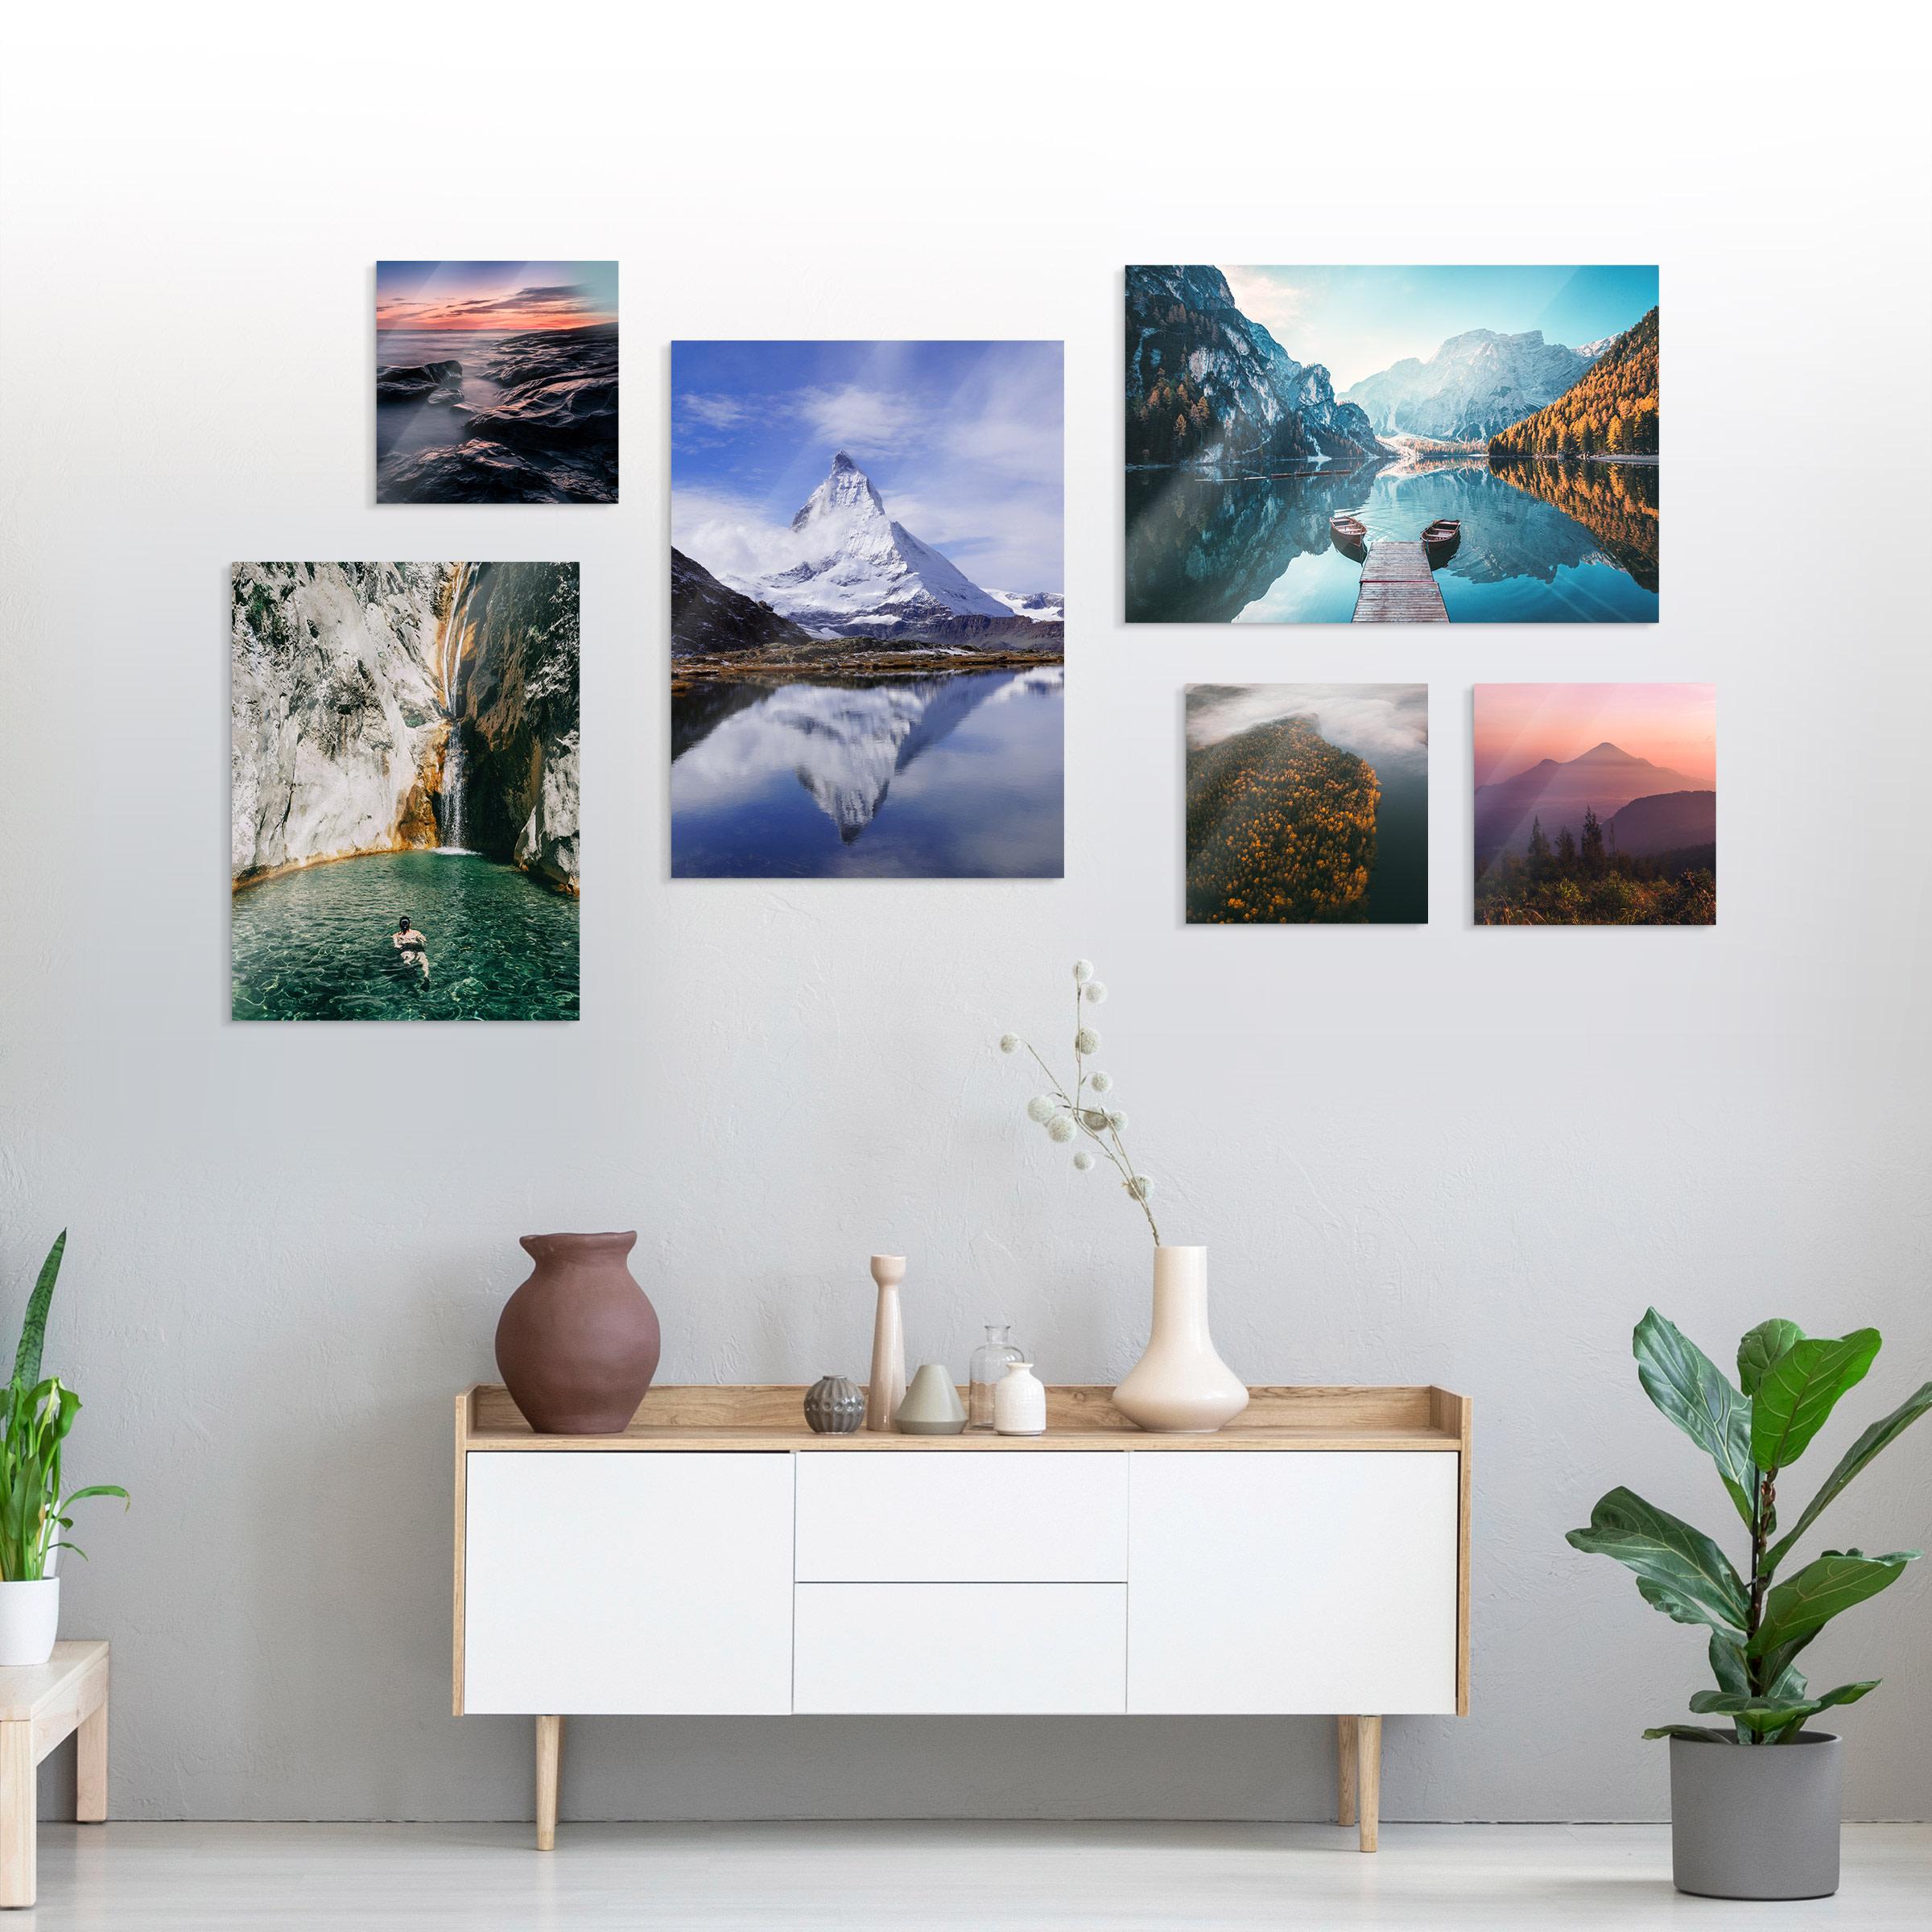 echter-fotoabzug-hinter-acrylglas-inspiration-1200x1200.jpg